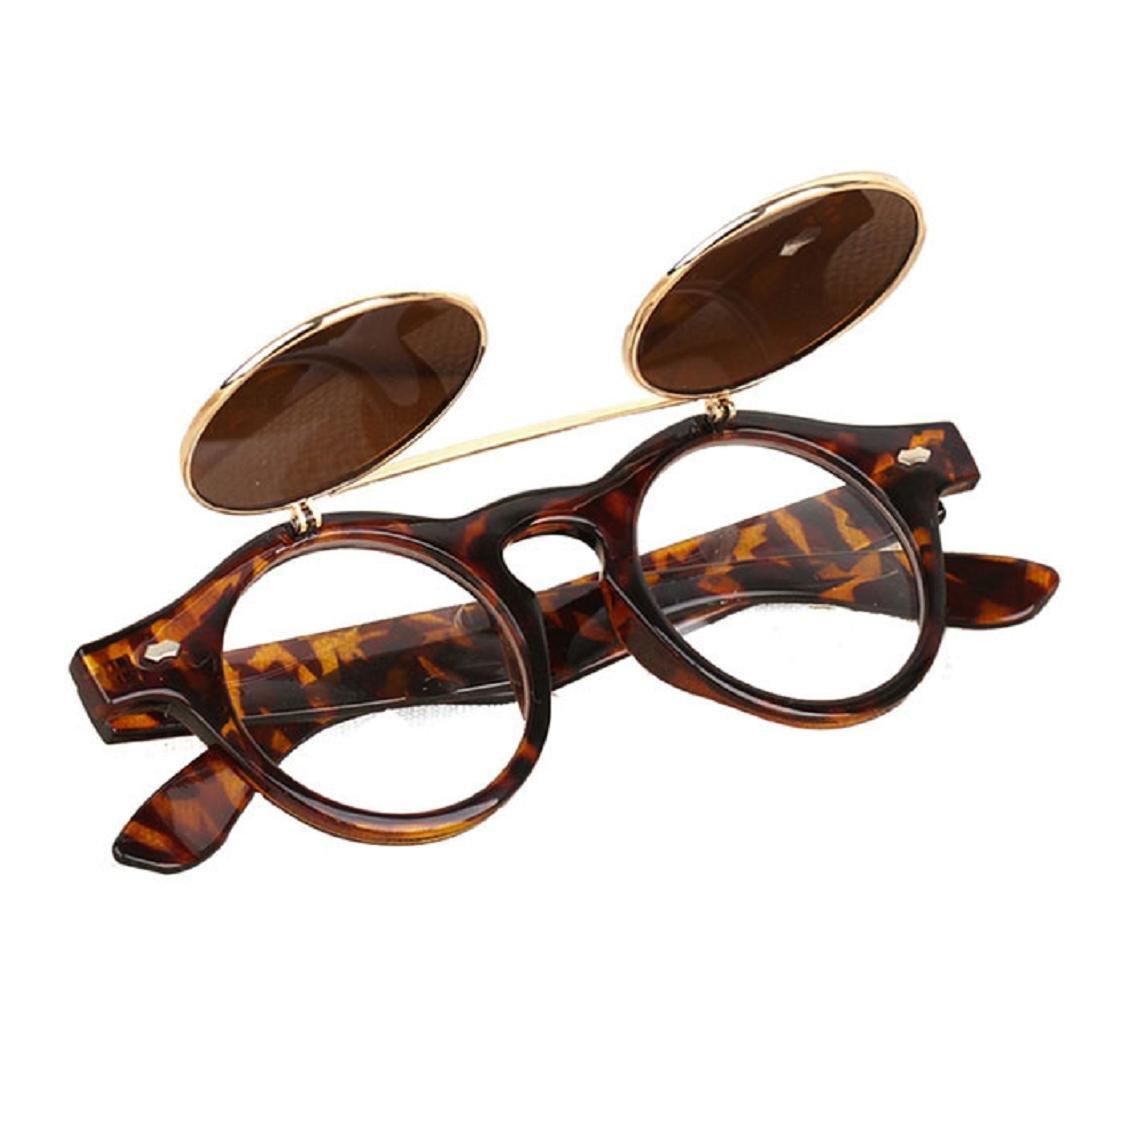 Mchoice Steampunk Goth Goggles Glasses Retro Flip Up Round Sunglasses Vintage (A)